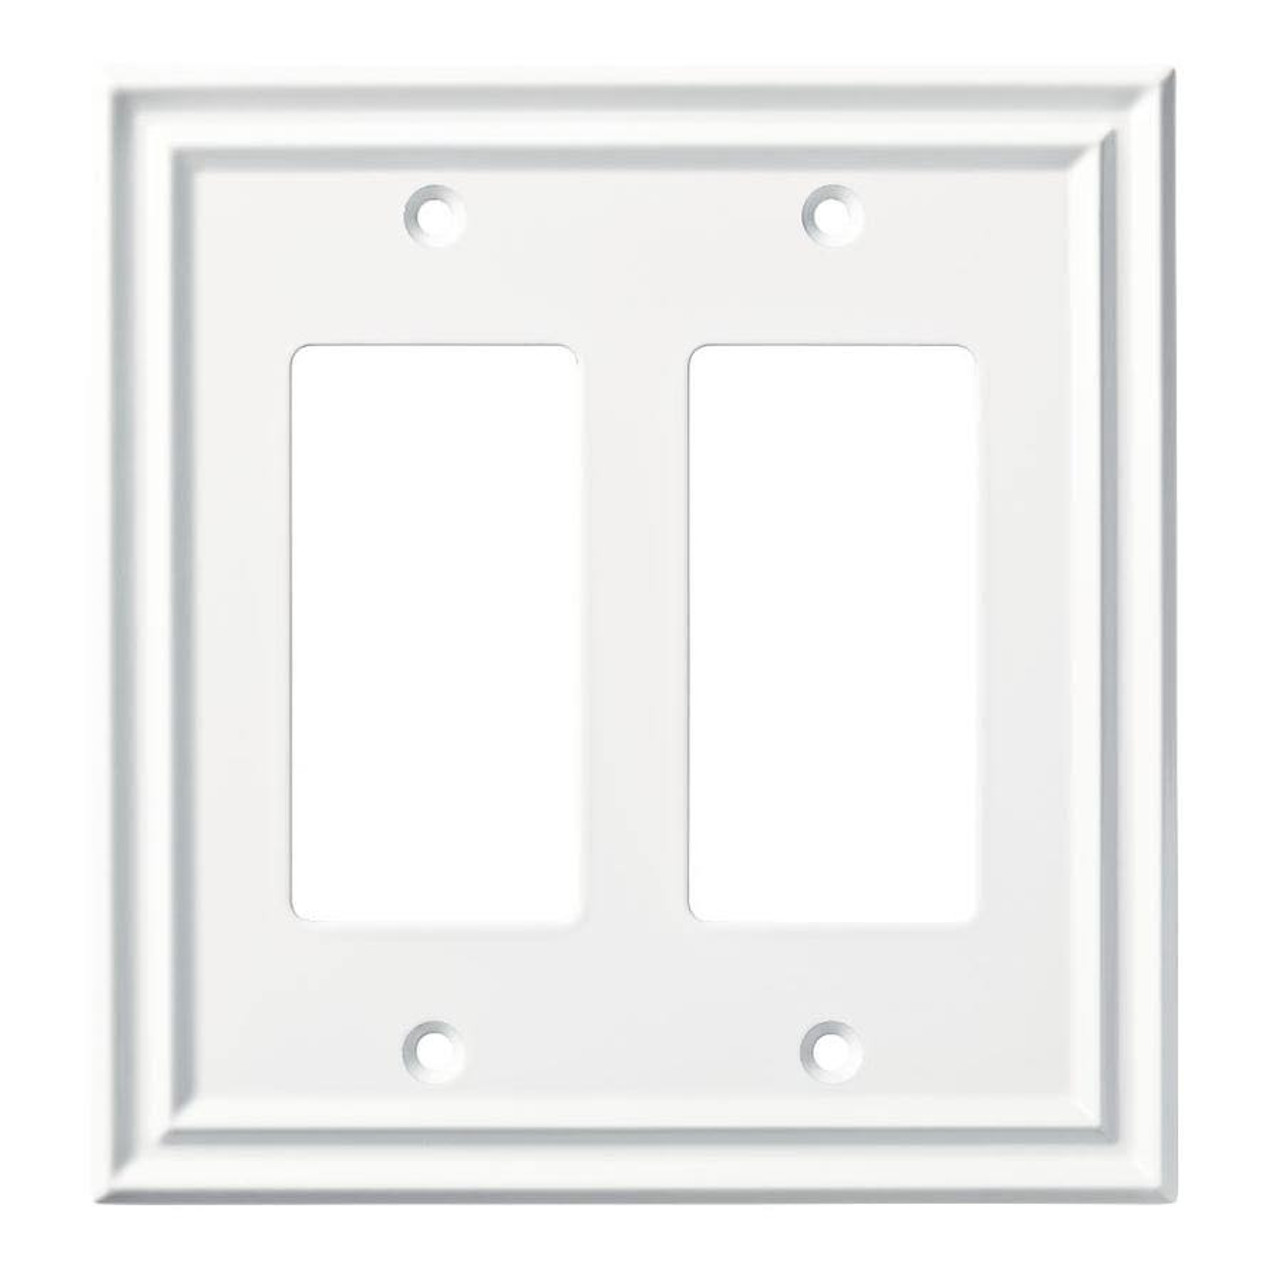 Brainerd W36560-PW Traditional Double GFCI Decora Pure White Wall Plate Cover